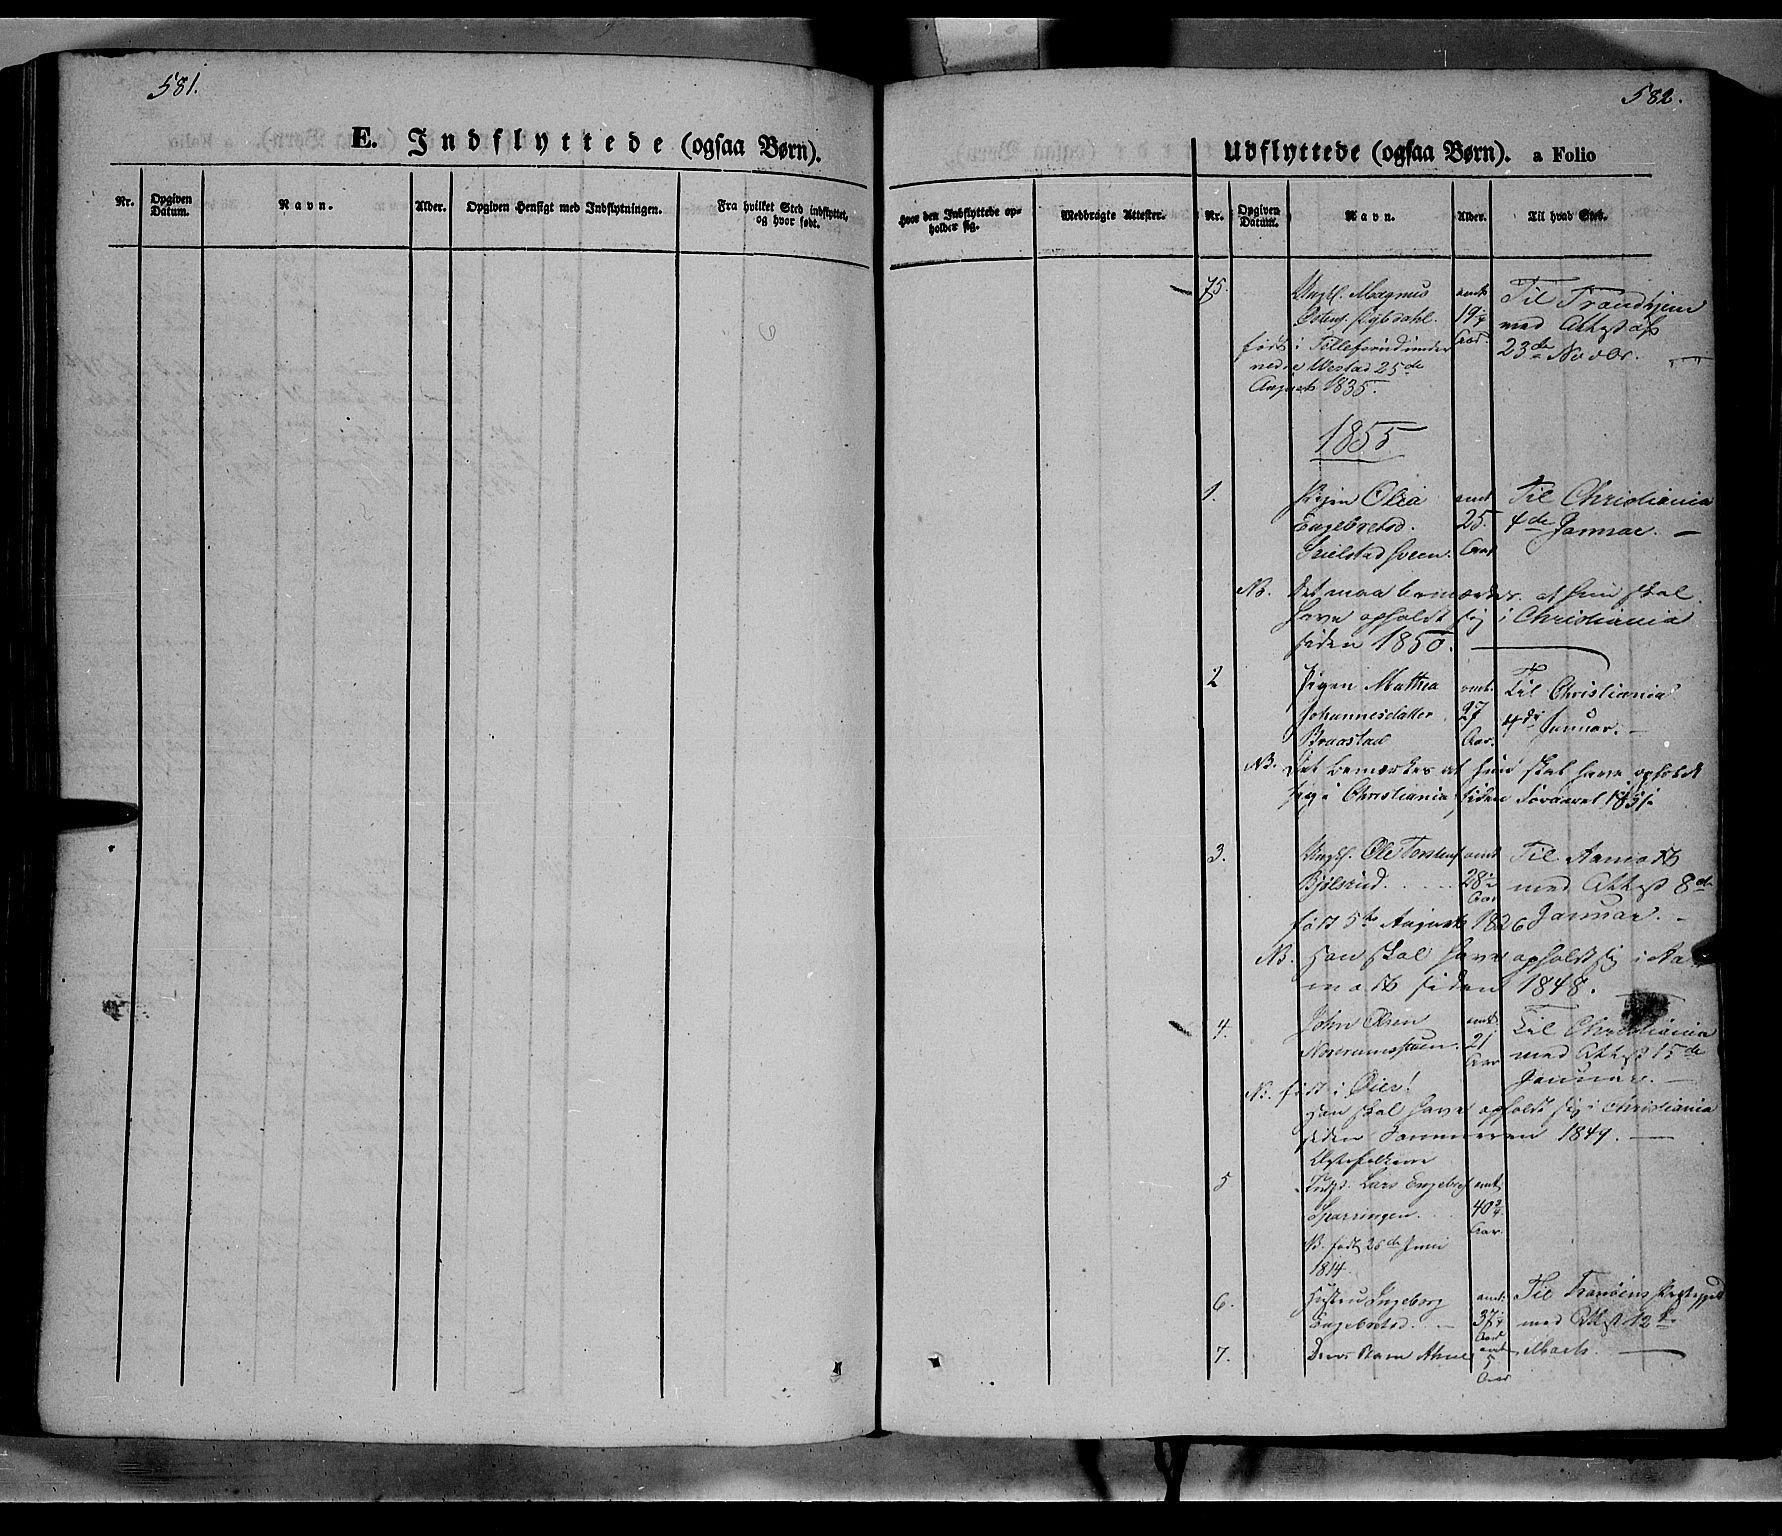 SAH, Ringebu prestekontor, Ministerialbok nr. 6, 1848-1859, s. 581-582